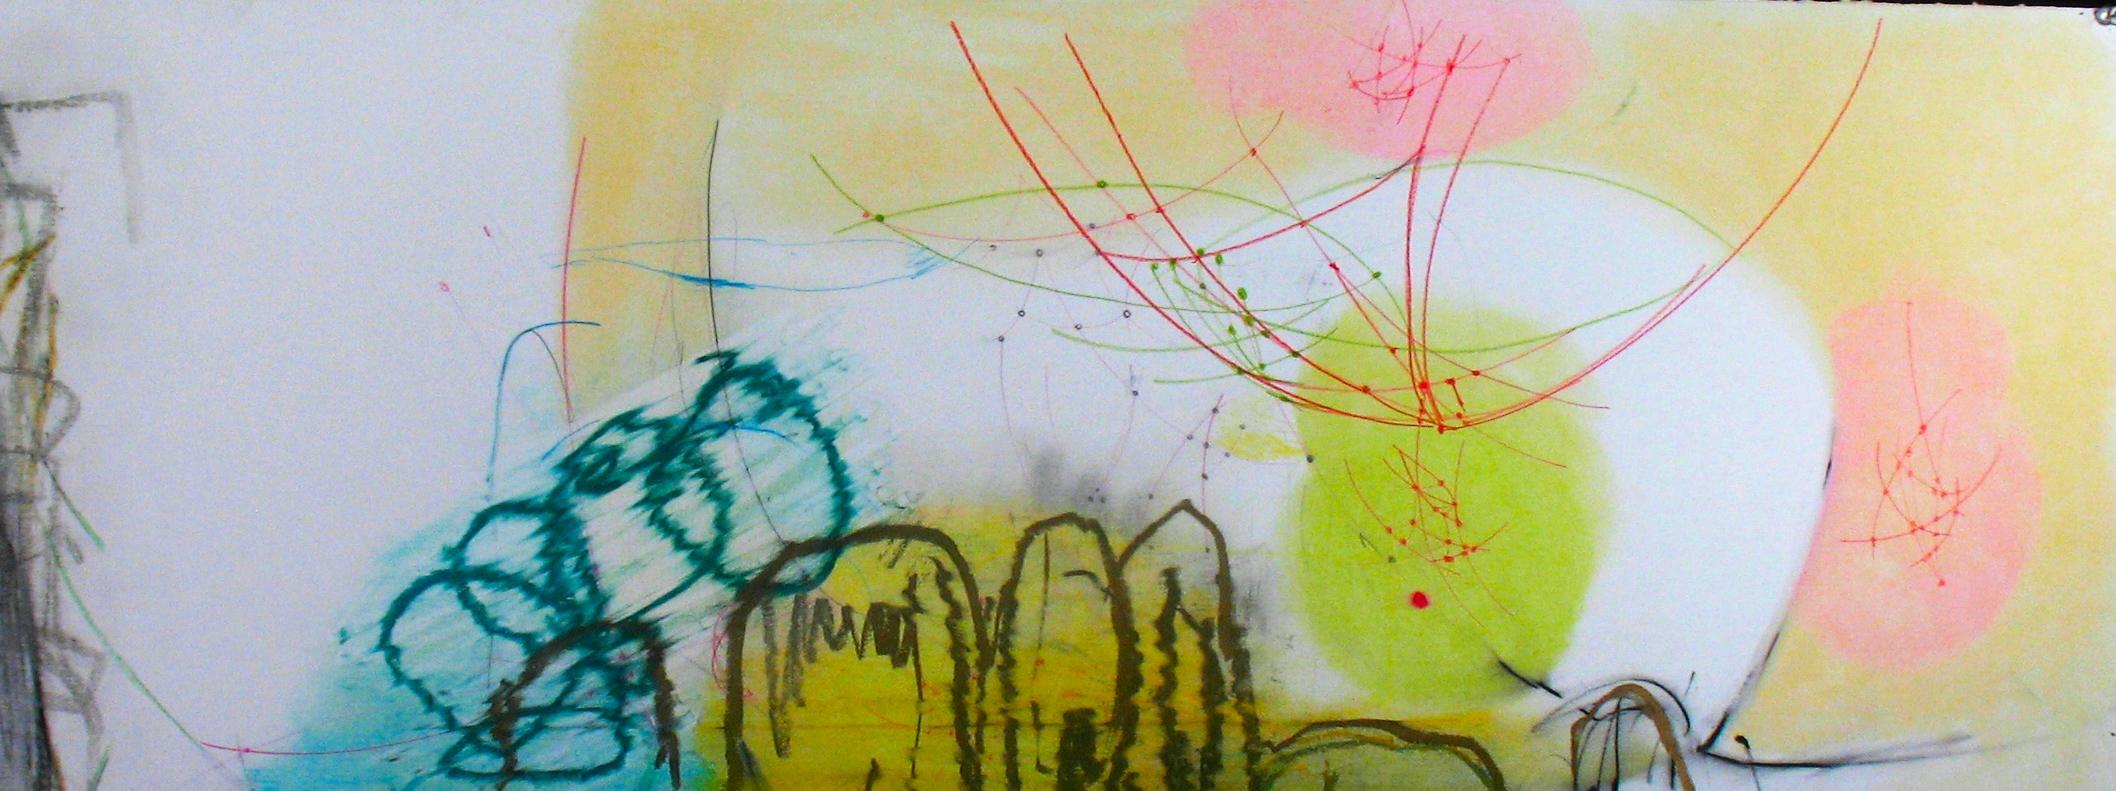 Linda LaBella Studio (@bedeadly) Cover Image